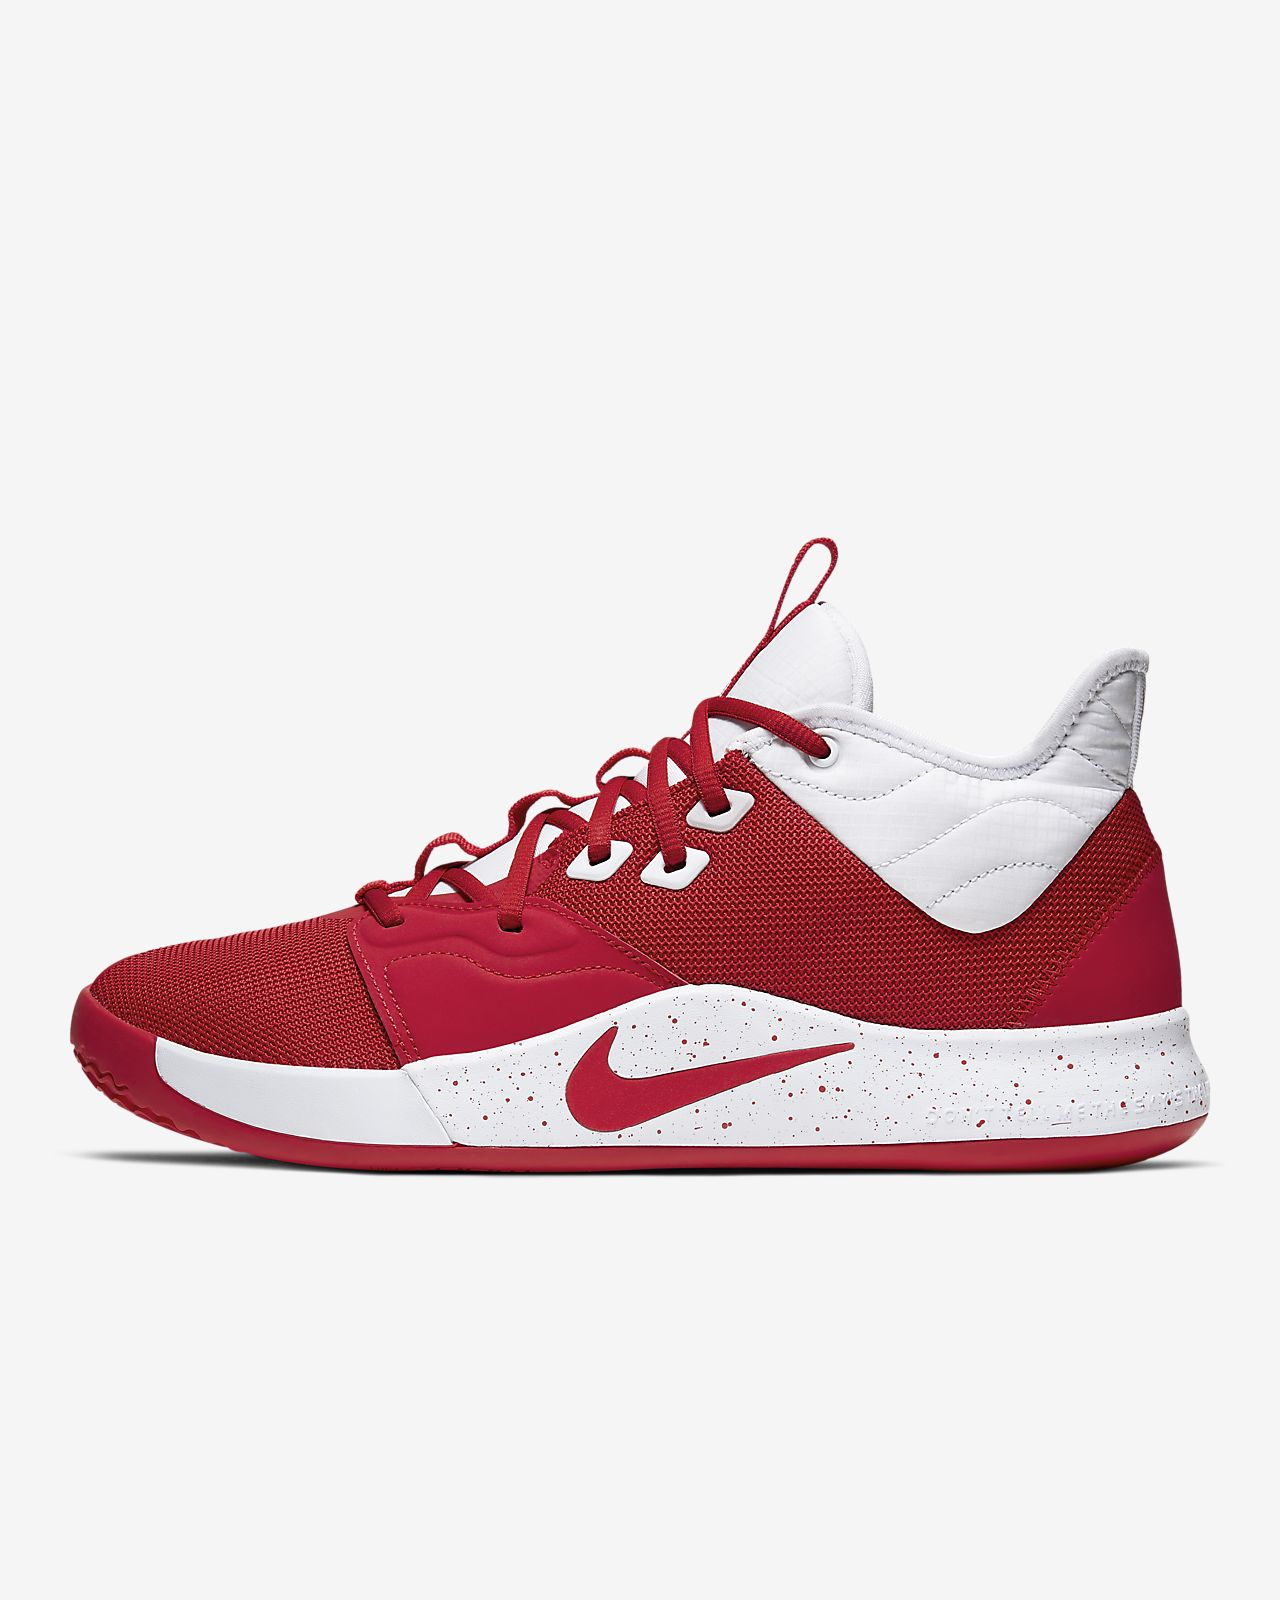 PG 3 (Team) Basketball Shoe